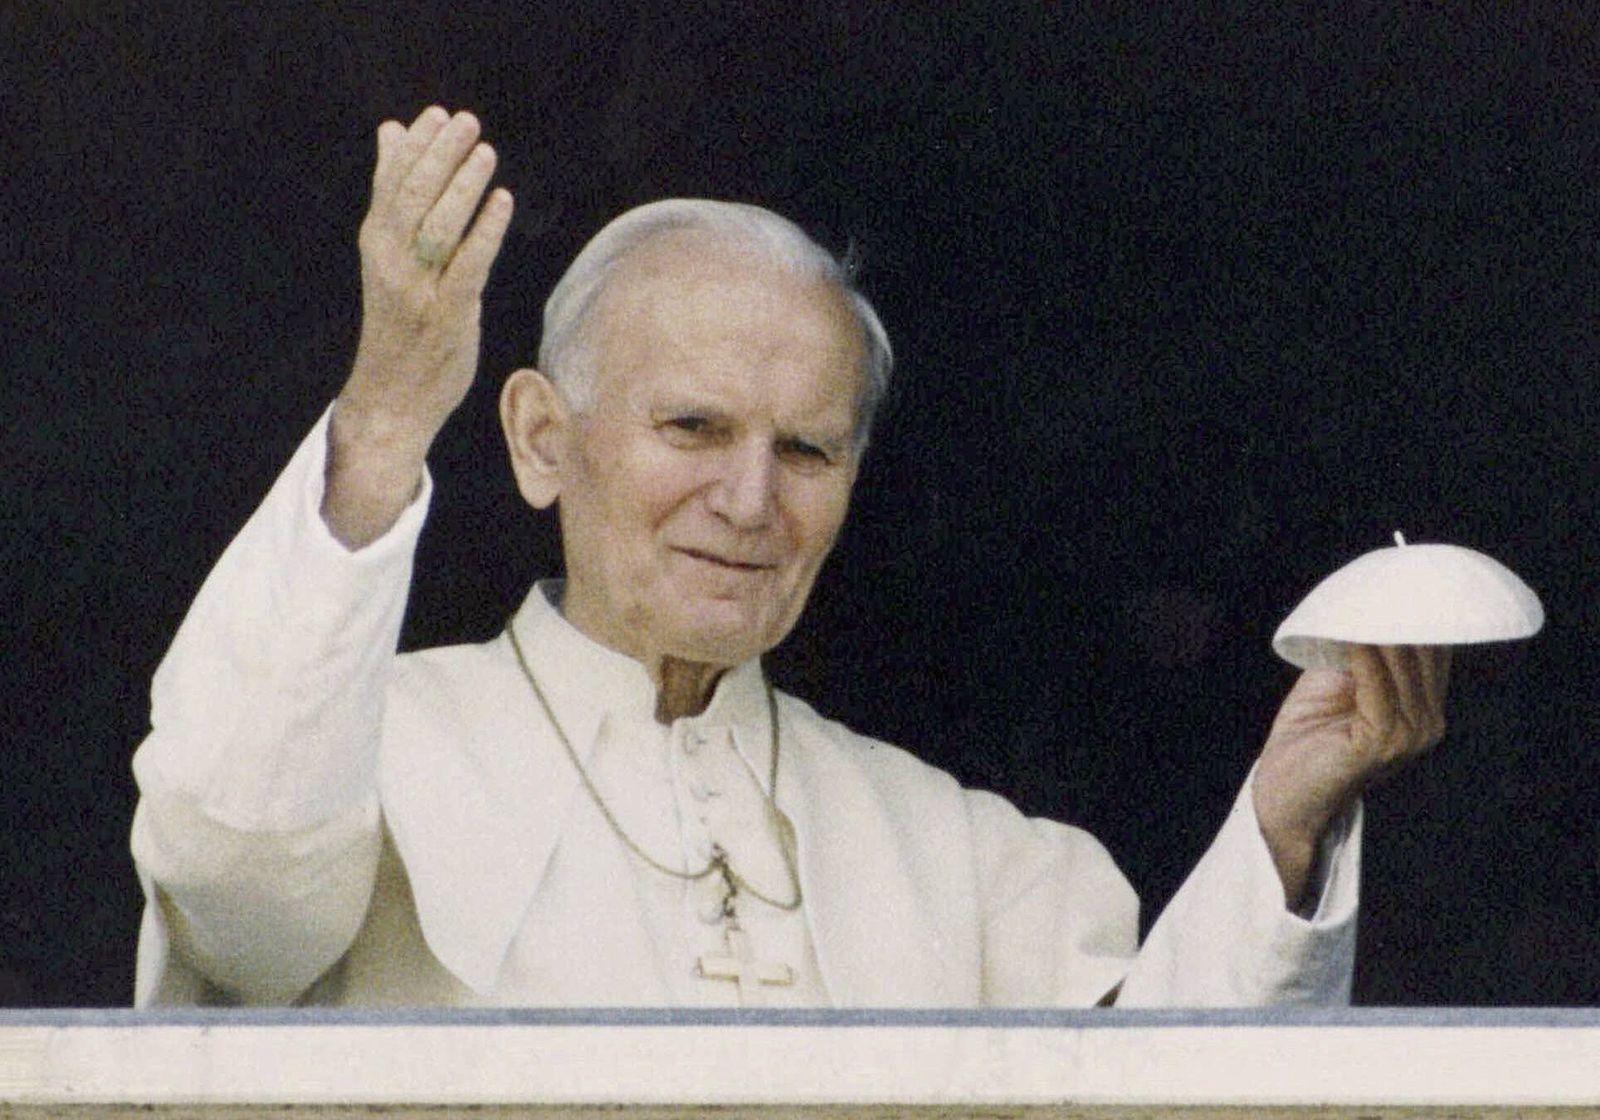 NUR FÜR FLASH Karol Wojtyla/ Papst Johannes Paul II